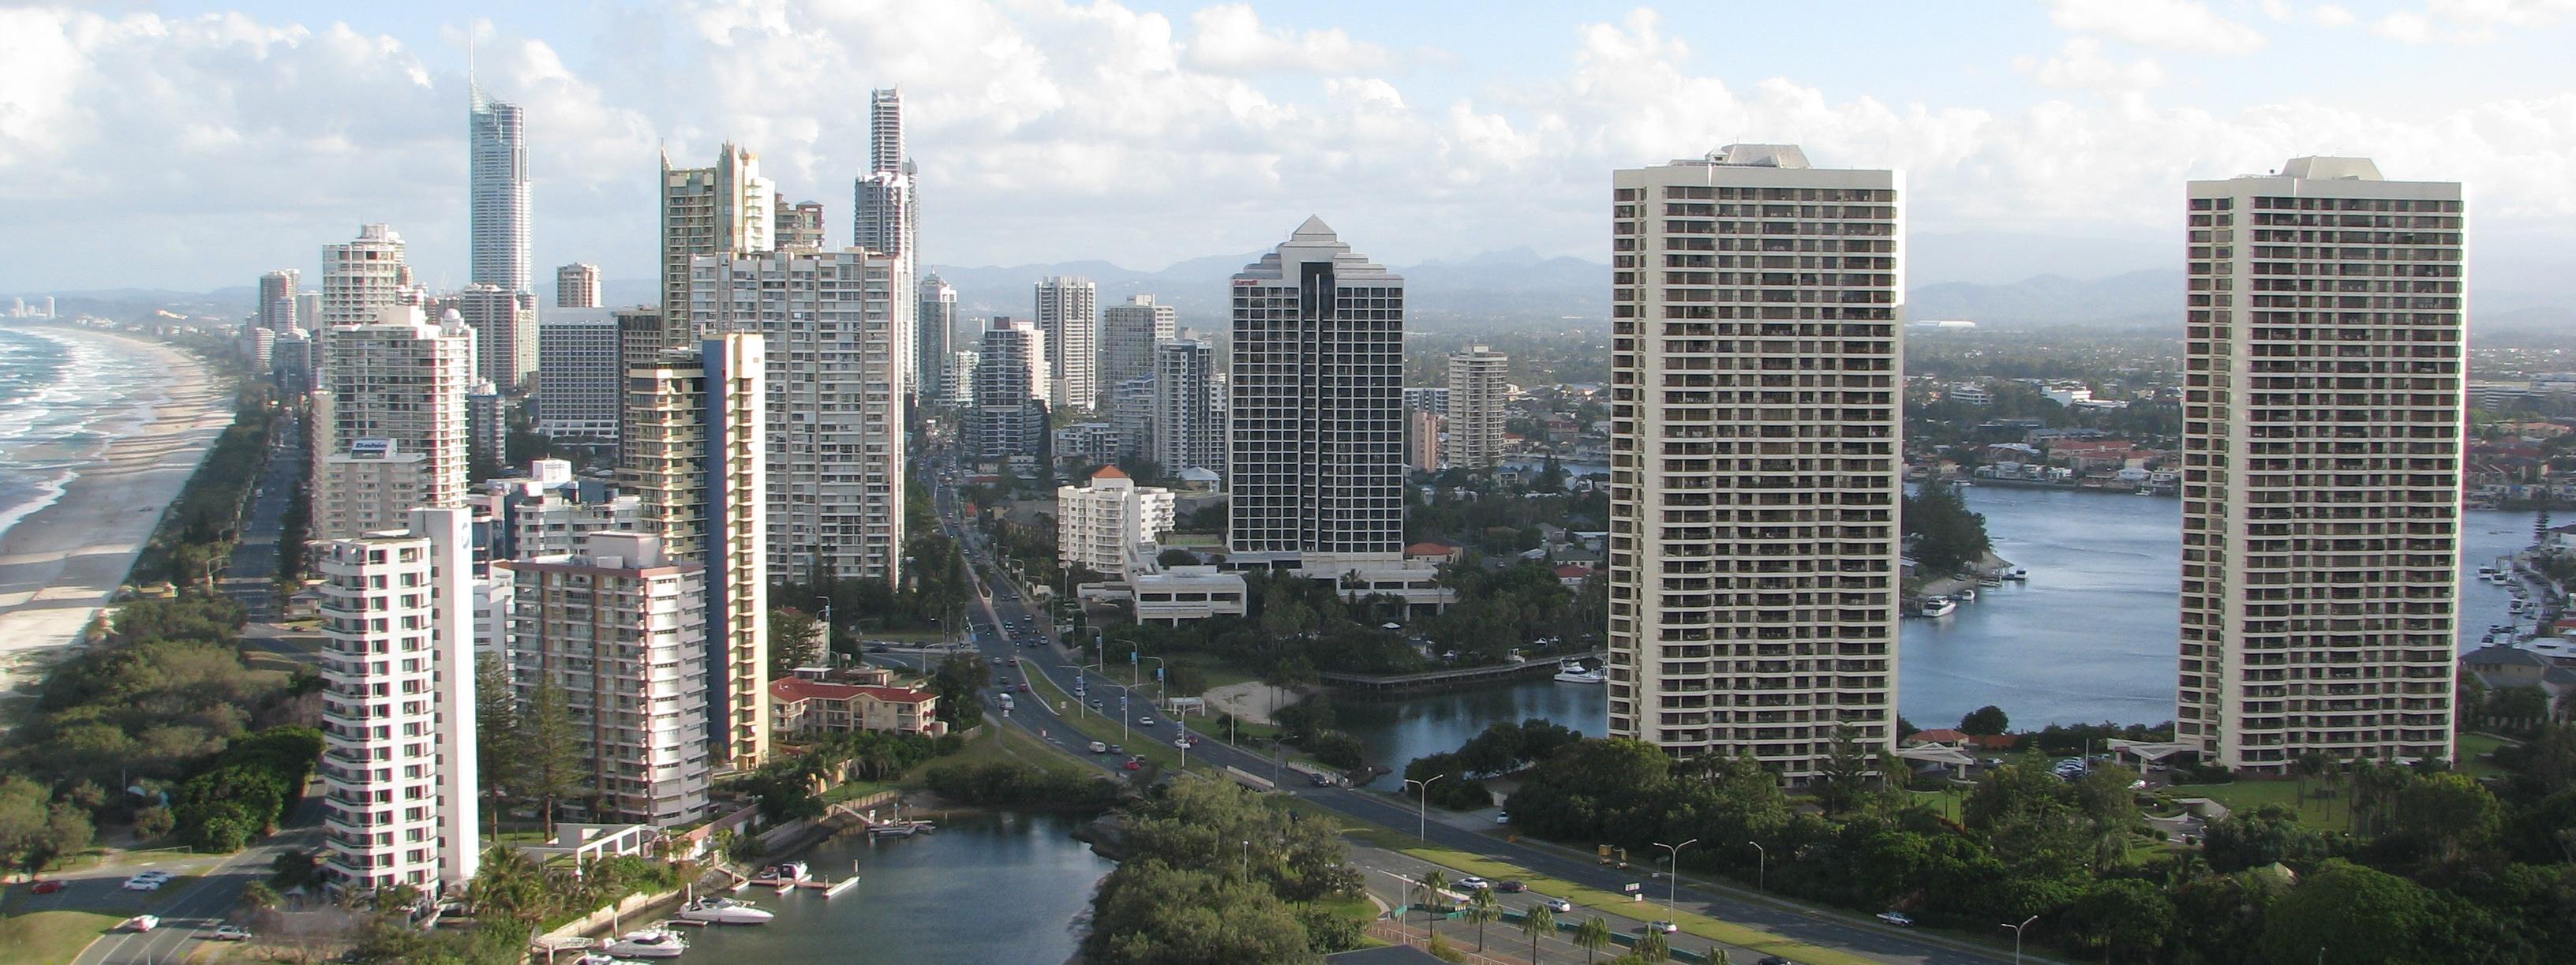 Miami Beach Gold Coast Webcam